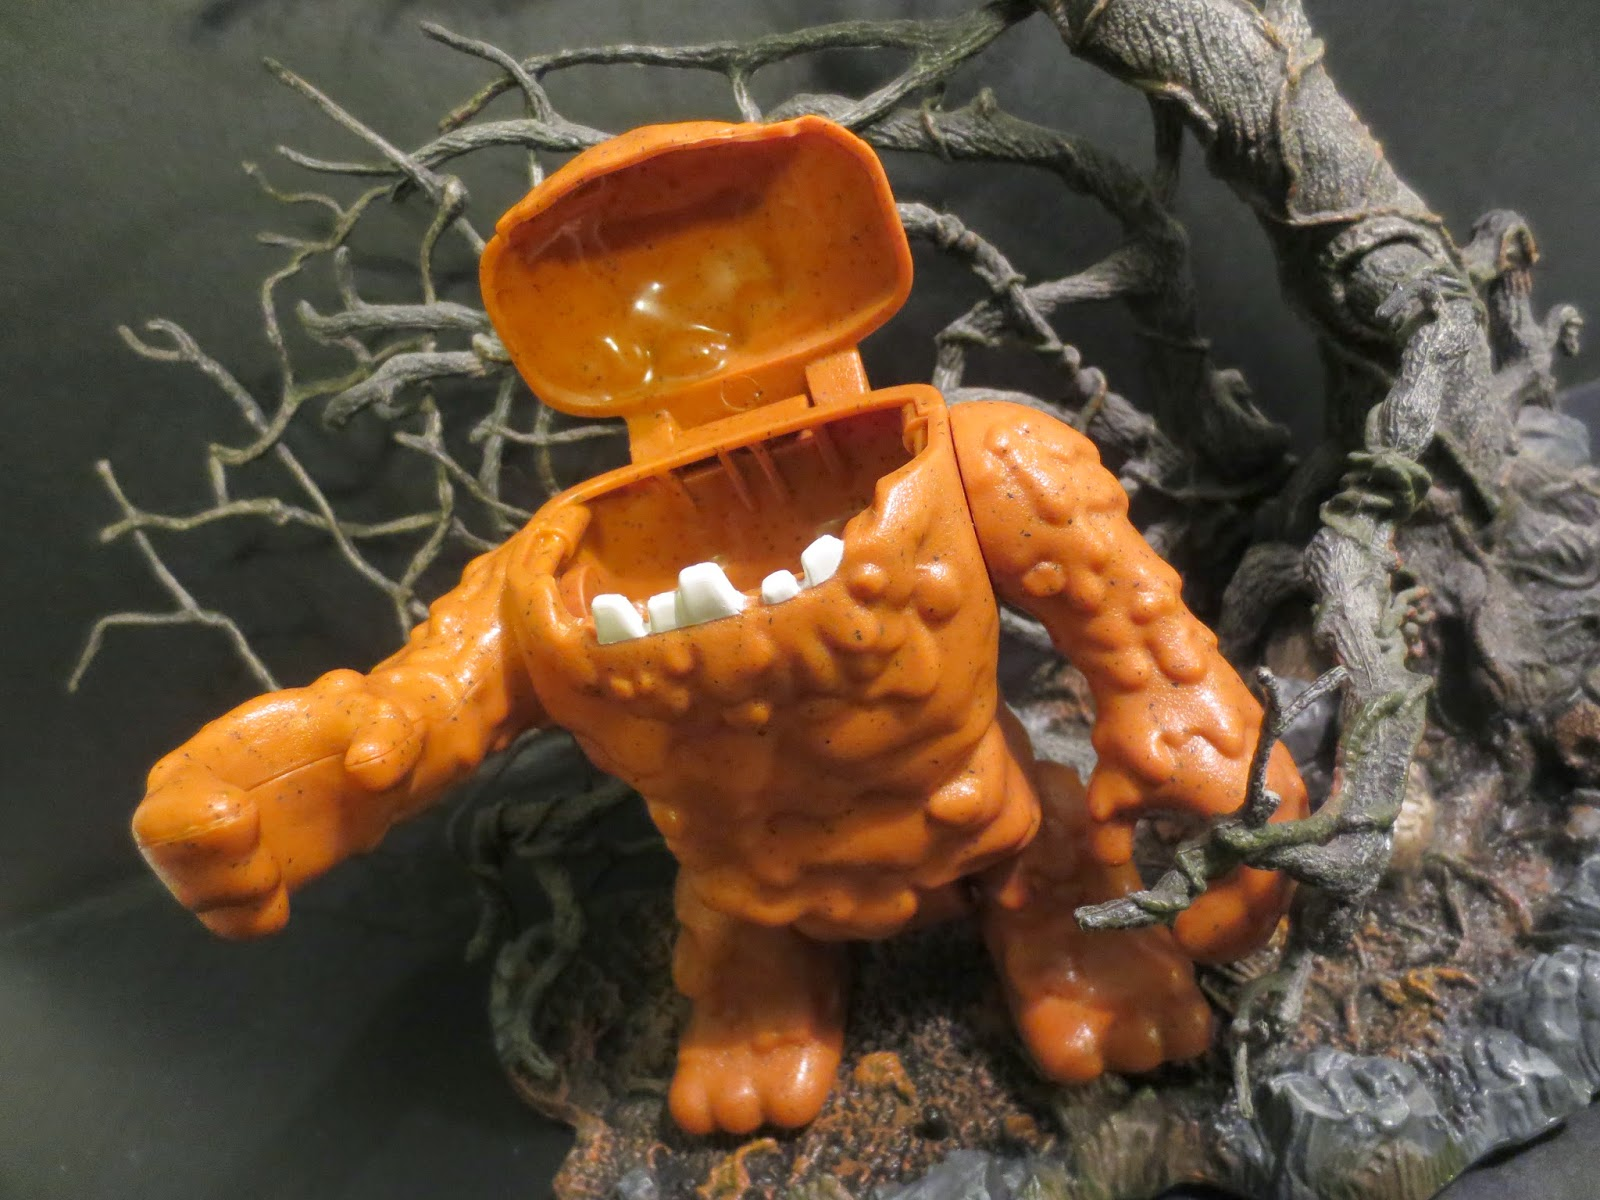 Batman Animated Series Clayface Action Figure  |Clayface Action Figure